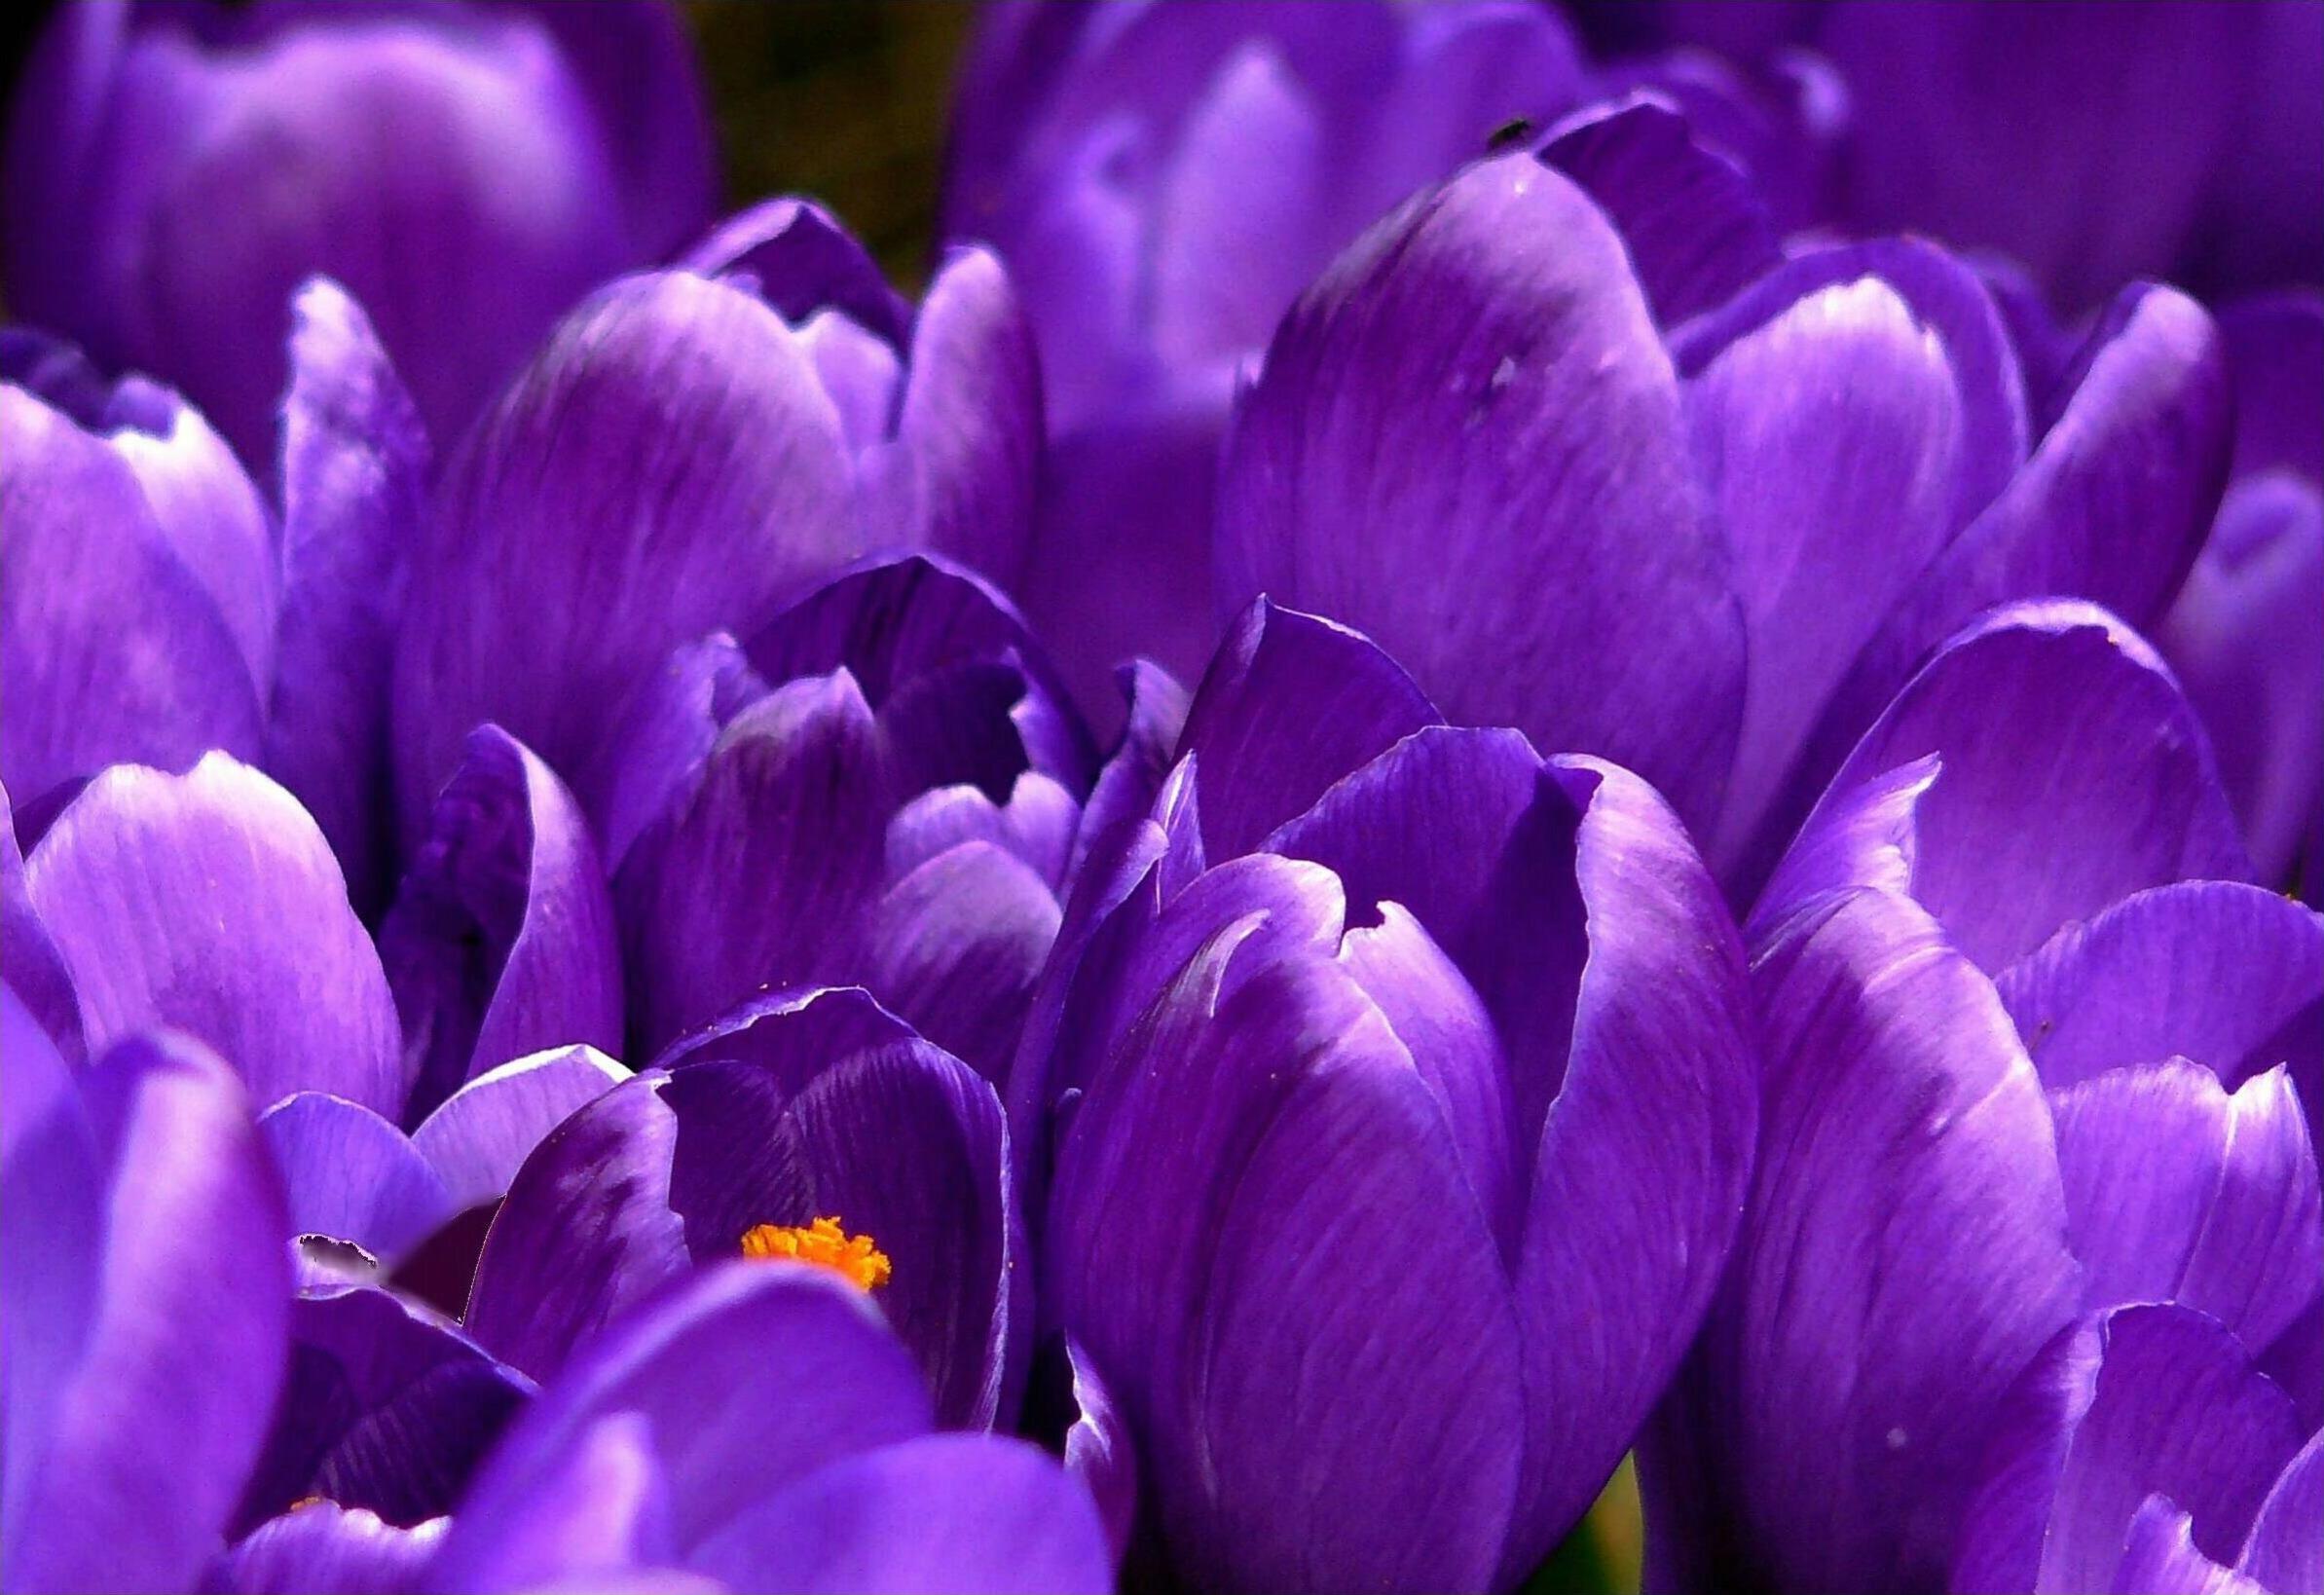 https://static.pexels.com/photos/59992/crocus-flower-spring-purple-59992.jpeg